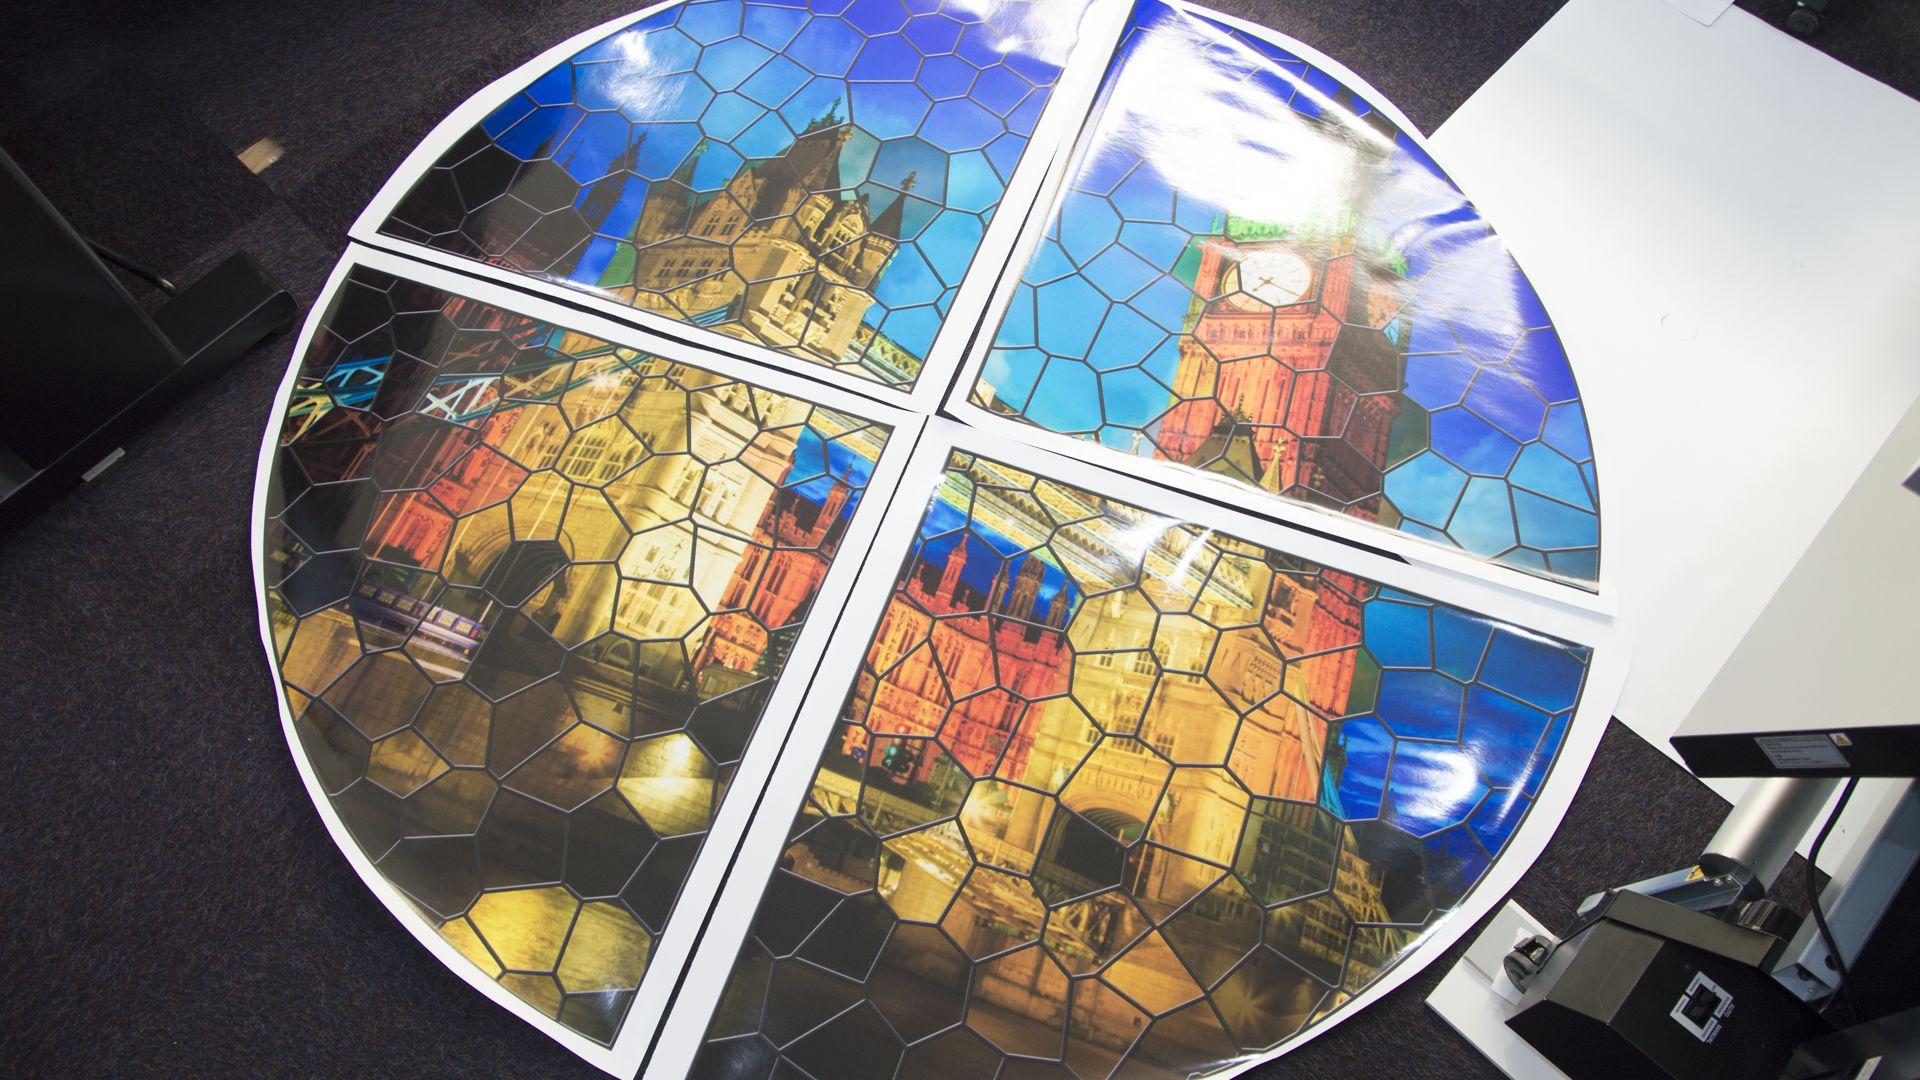 Transparent window film (3) stained glass, print, big ben, tower bridge, lead design